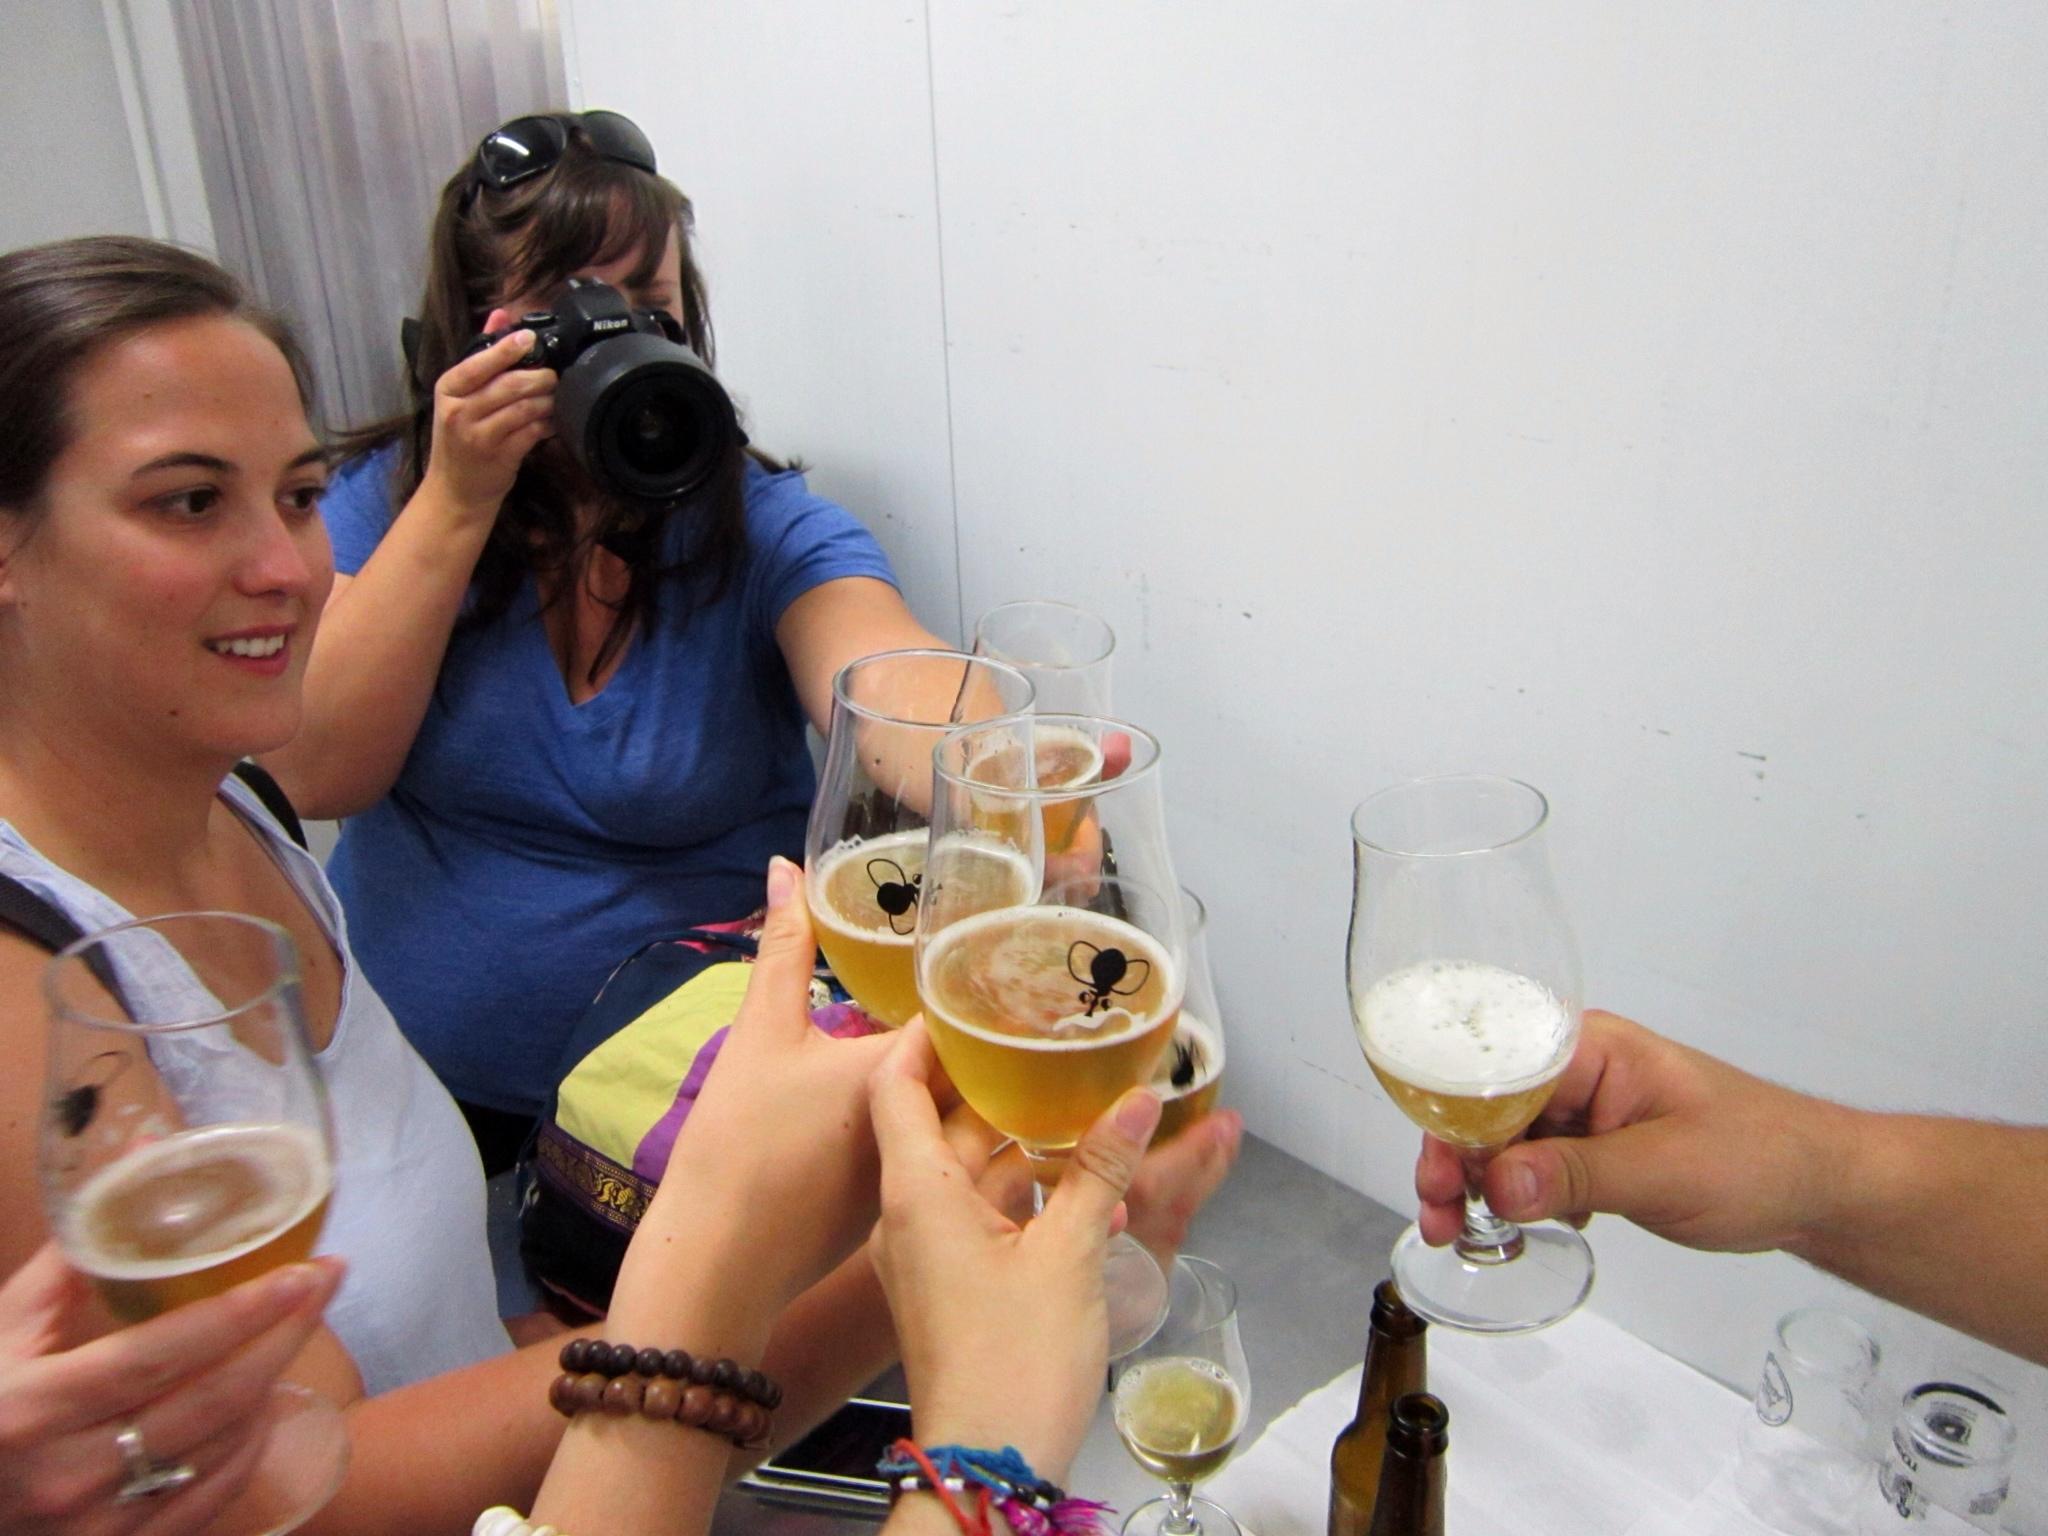 Beer glasses Moska toast